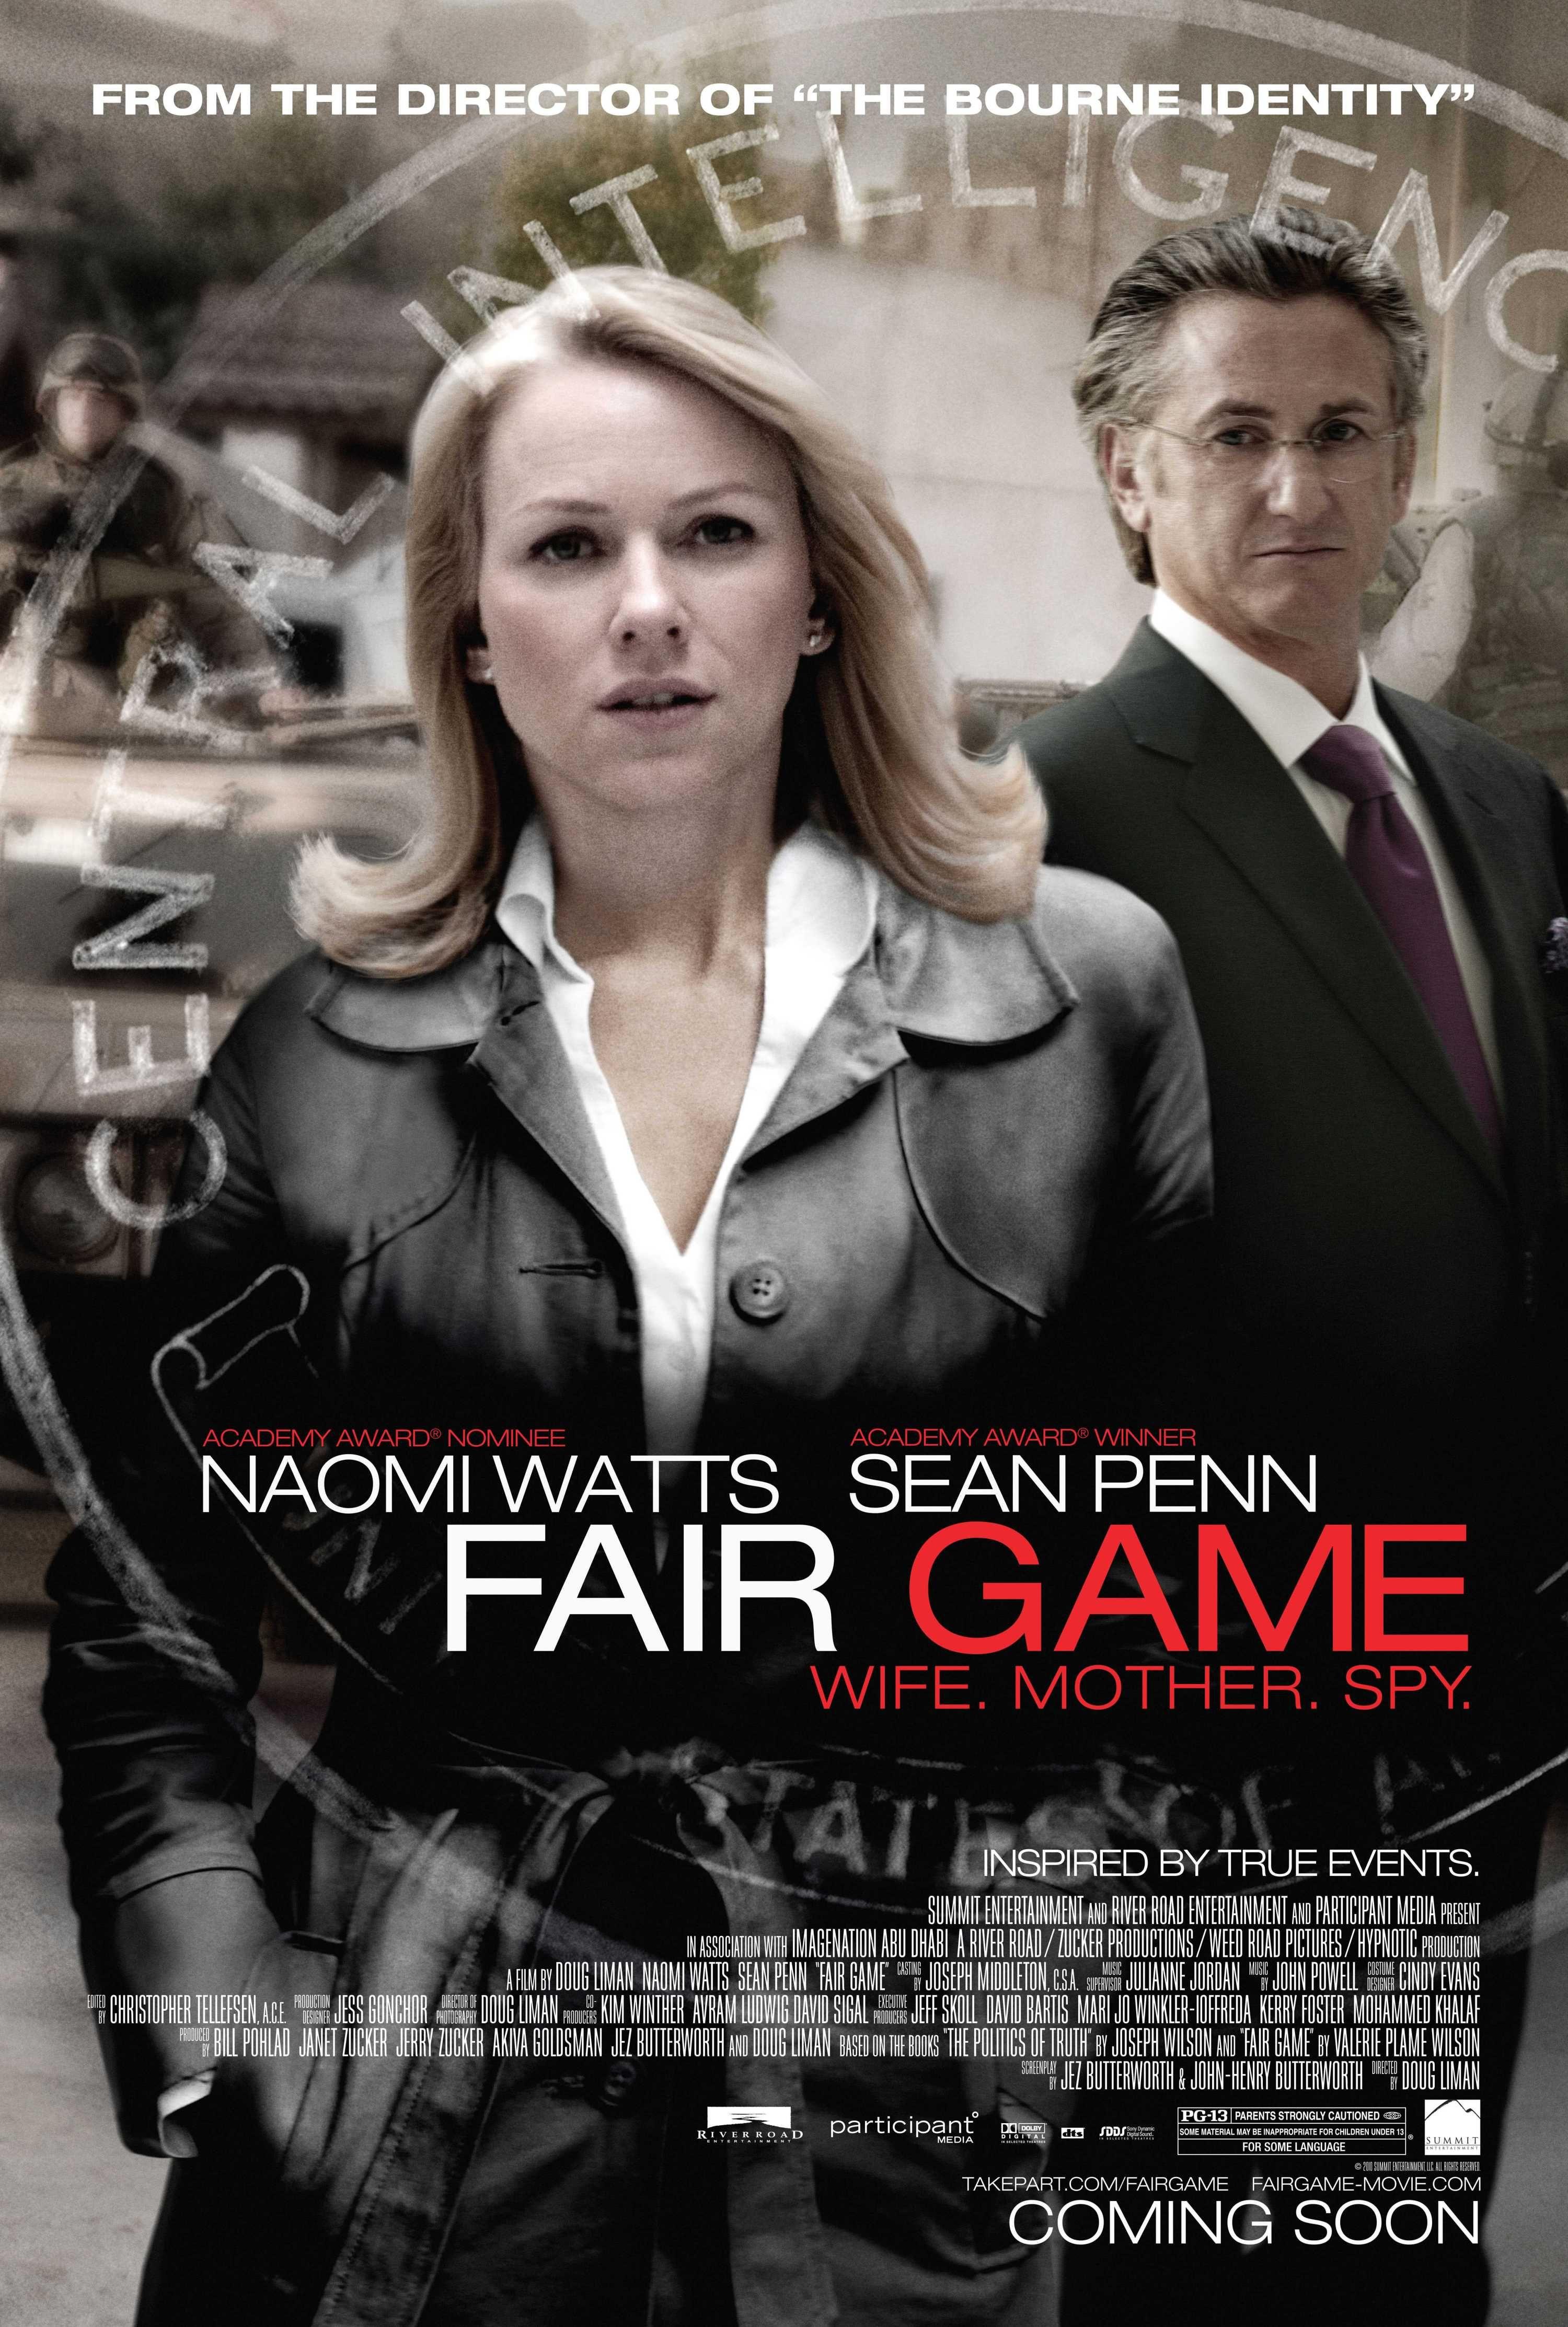 Fair Game 2010 Movie Film Cinema Yeonghwa Pelicula Poster Recommendation Mustsee Mustwatch Worthwatch Fair Games Naomi Watts Sean Penn